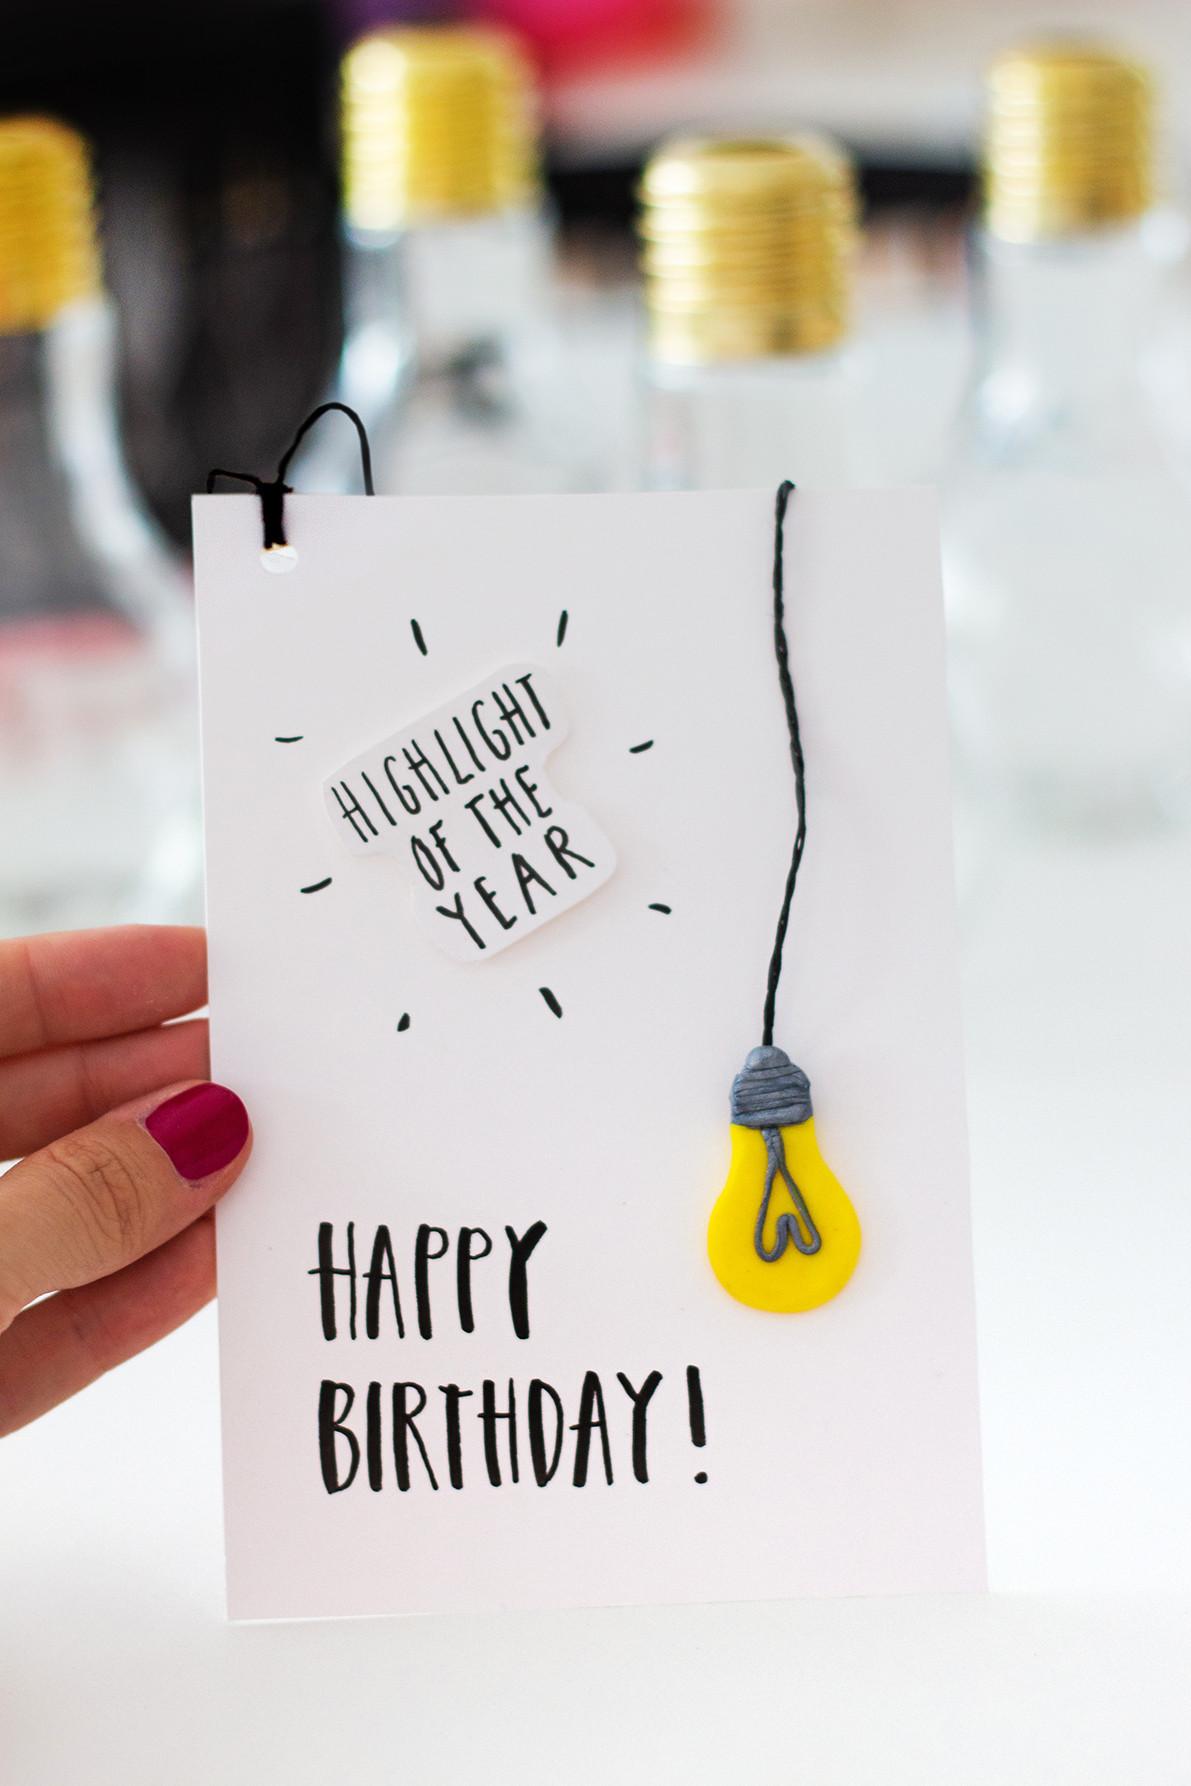 Diy Geburtstag  Geburtstagsgeschenke selber machen Drei DIY Ideen •